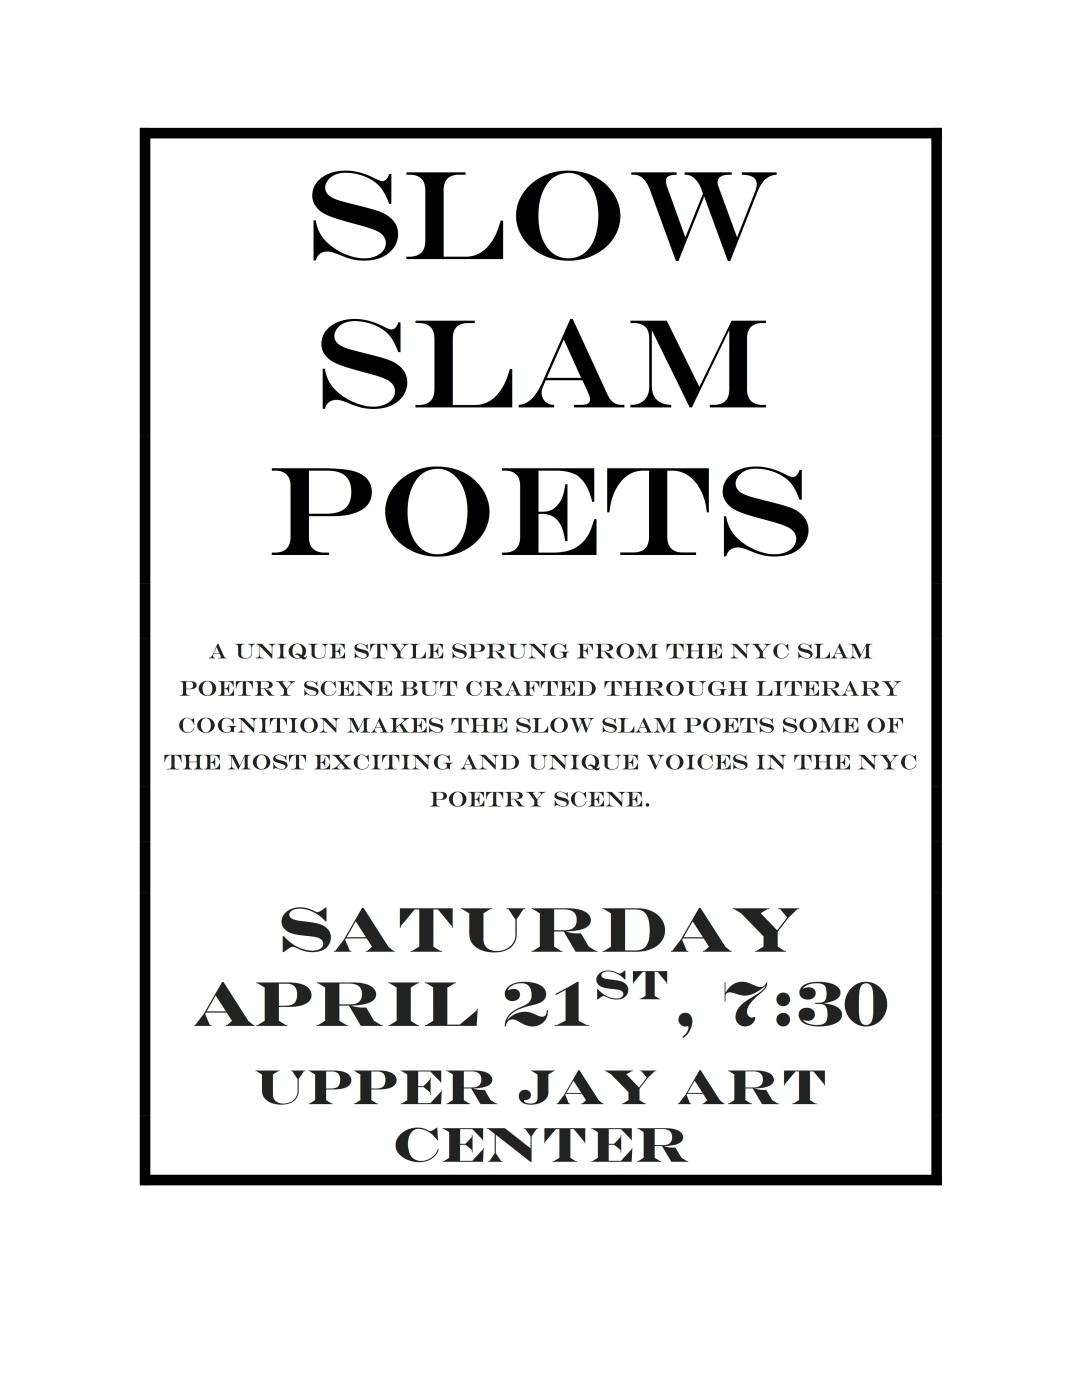 Slow Slam Poets